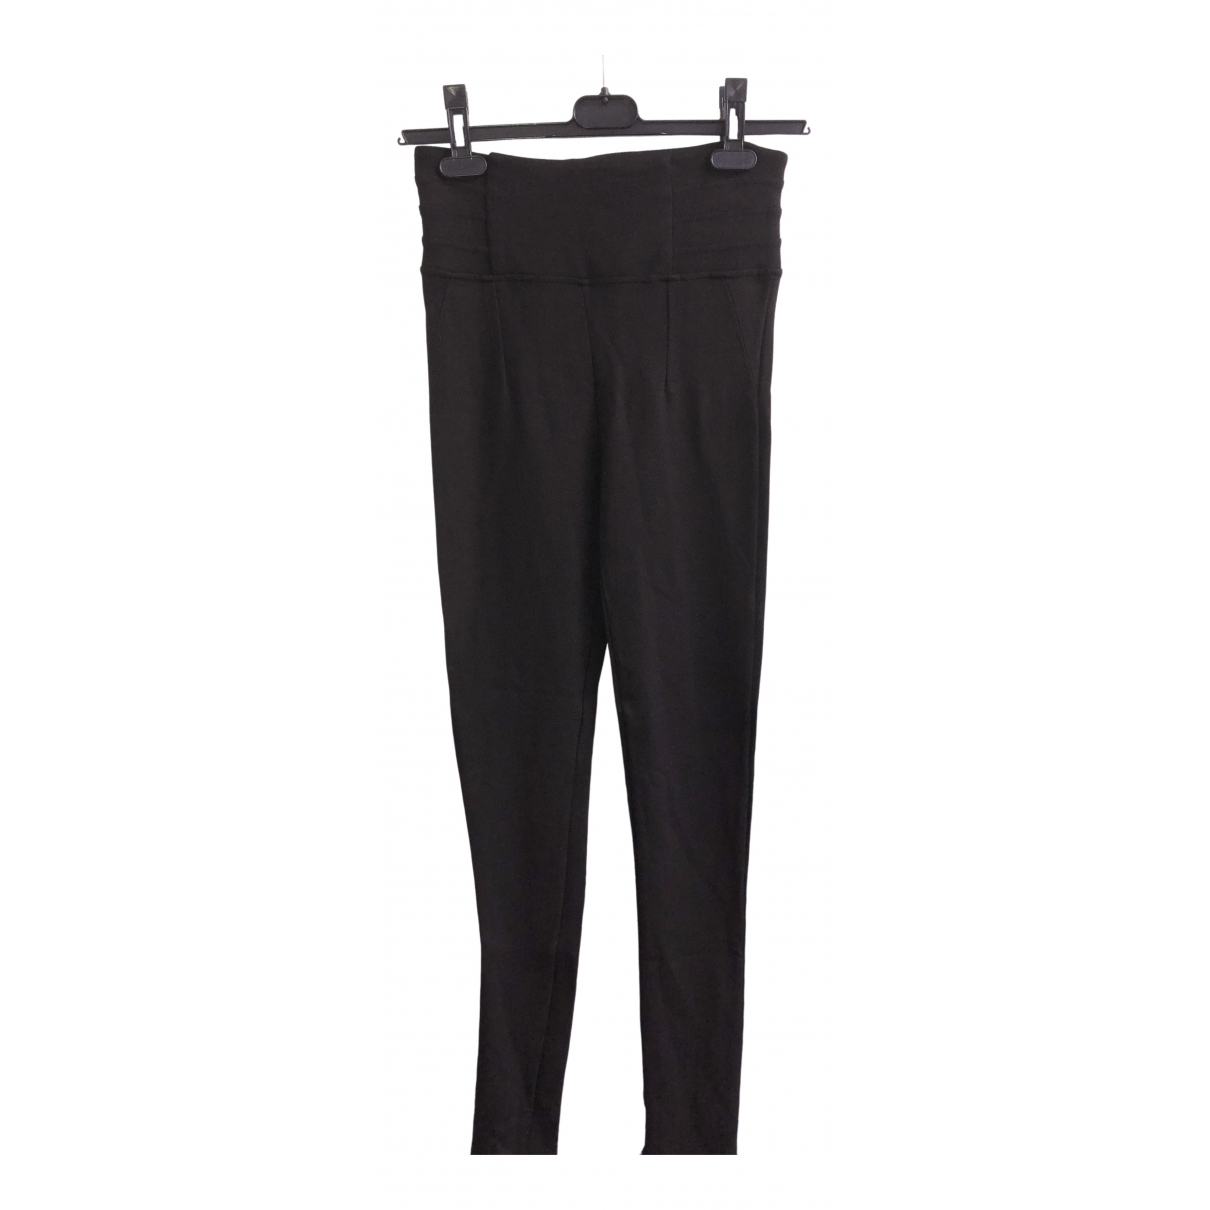 Zara N Black Cotton Trousers for Women L International